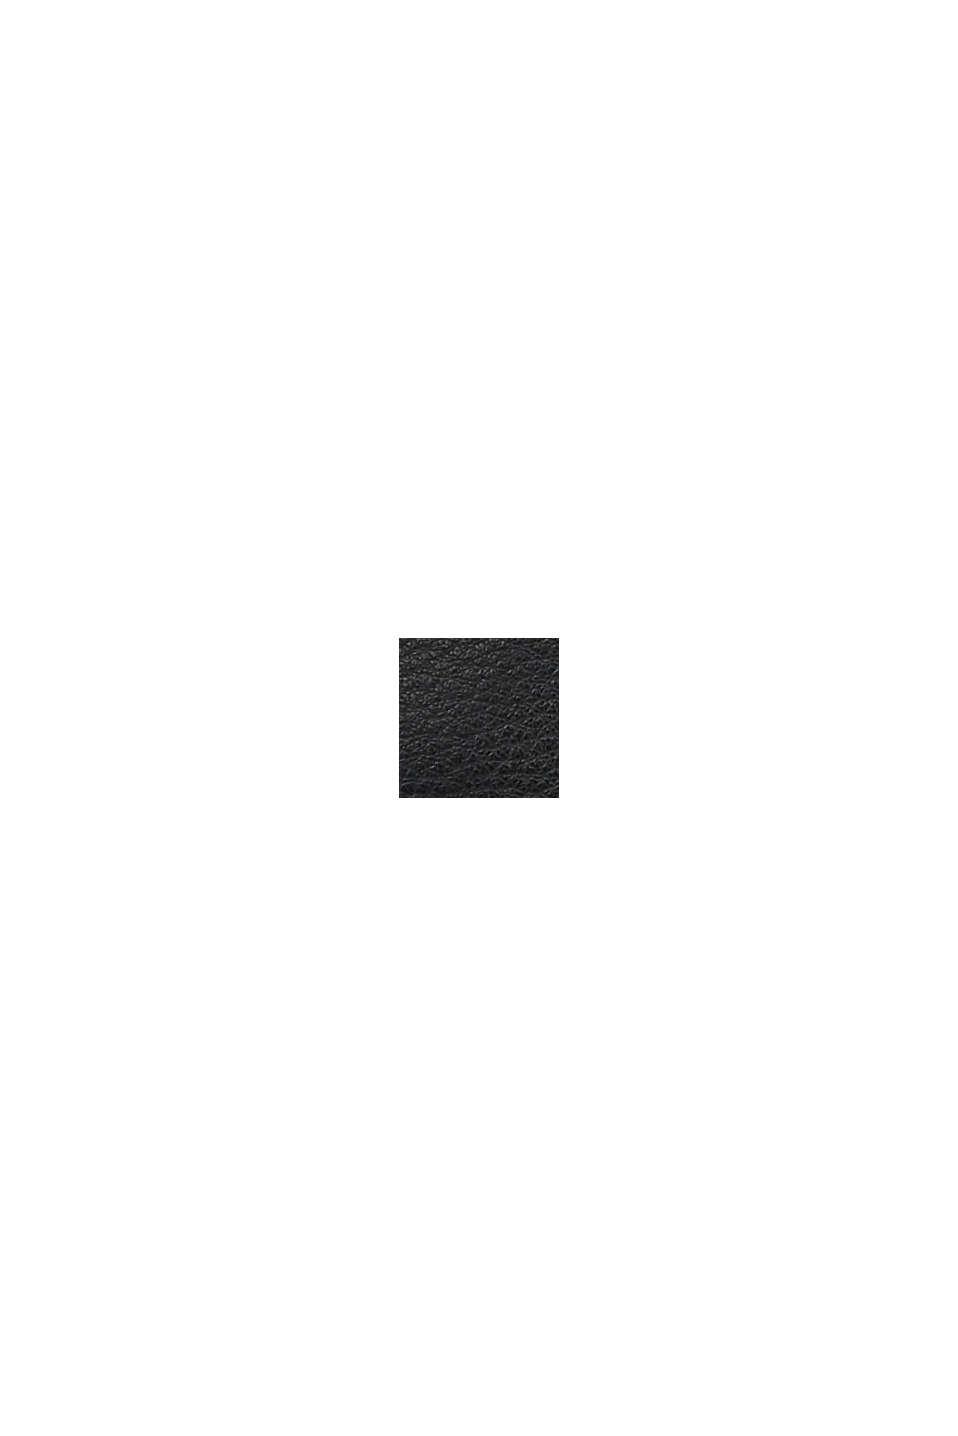 Hallie T. Kosmetik-Tasche in Leder-Optik, BLACK, swatch